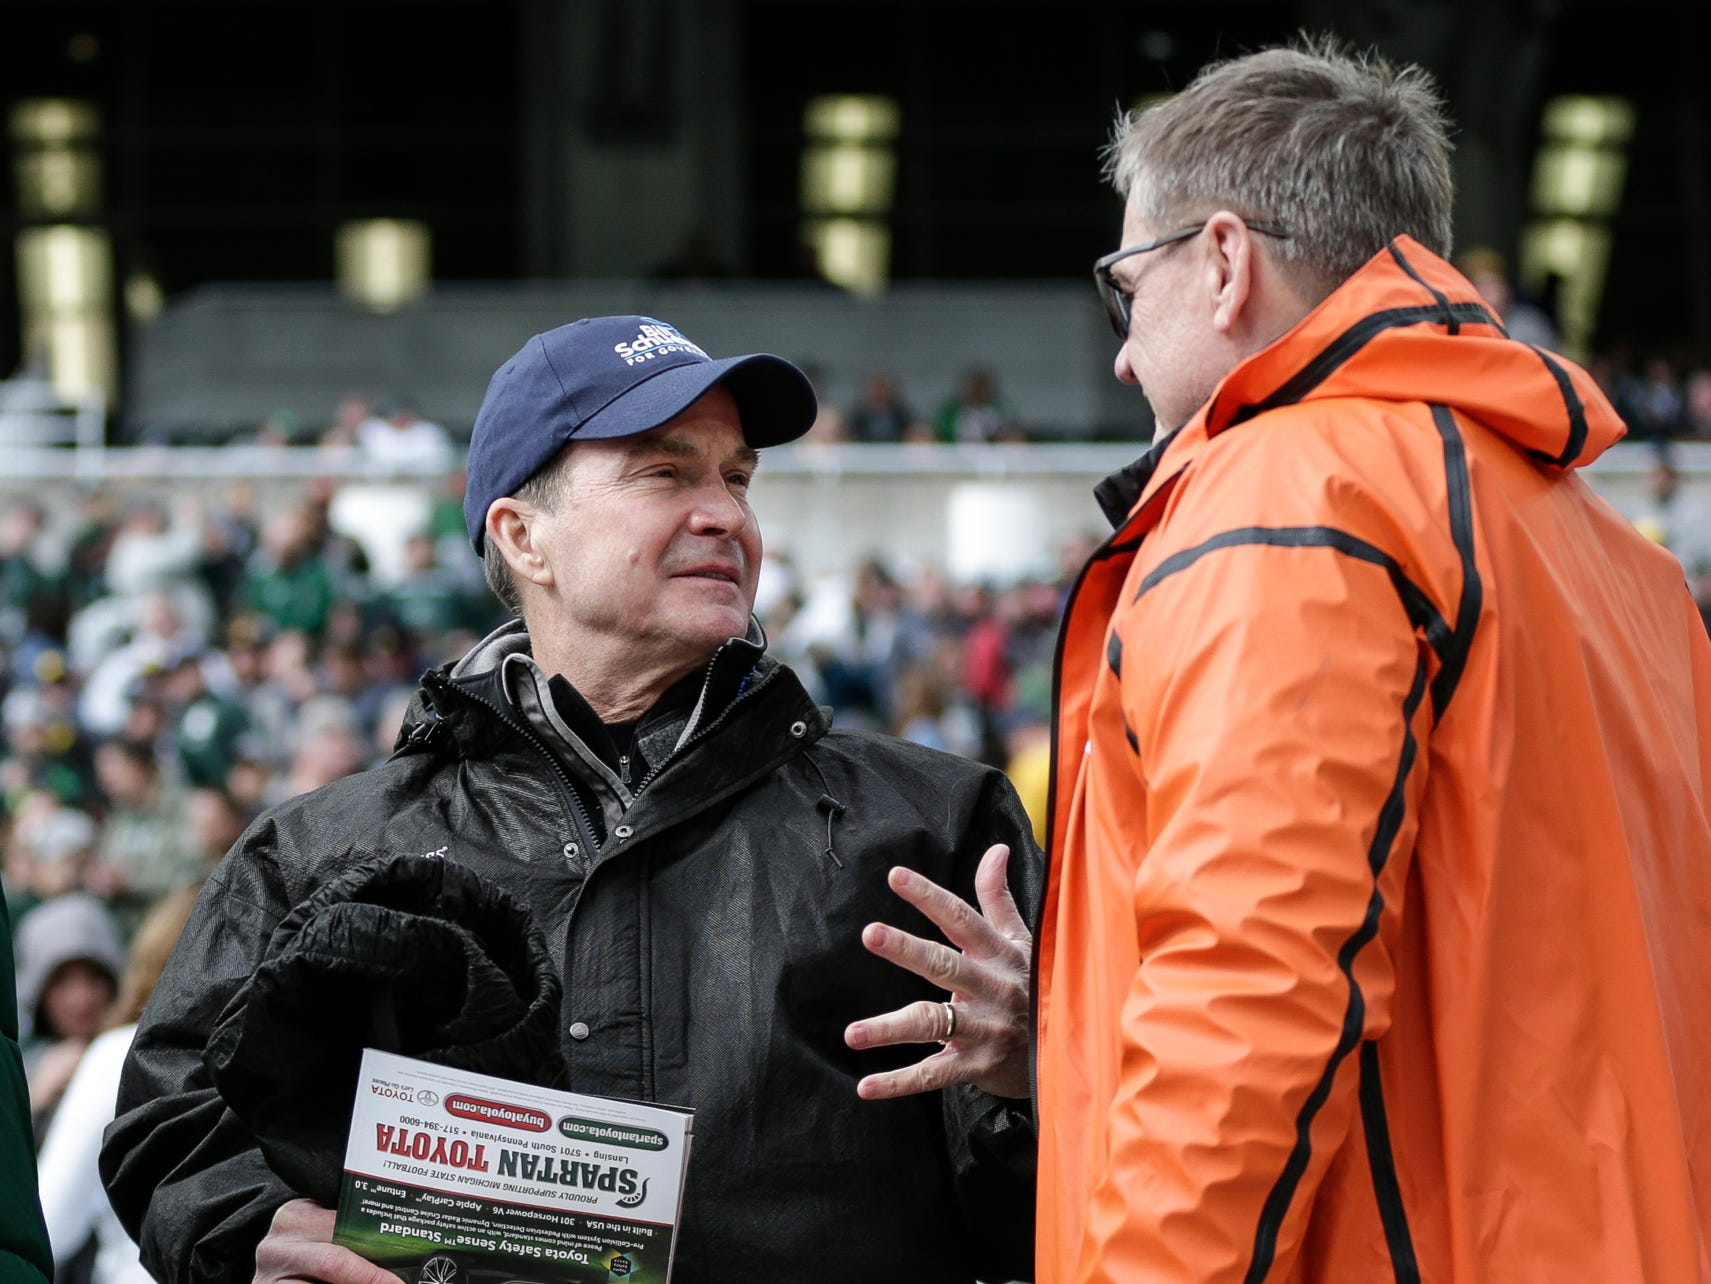 Republican gubernatorial candidate Bill Schuette during the Michigan-Michigan State game at Spartan Stadium on Saturday, Oct. 20, 2018.